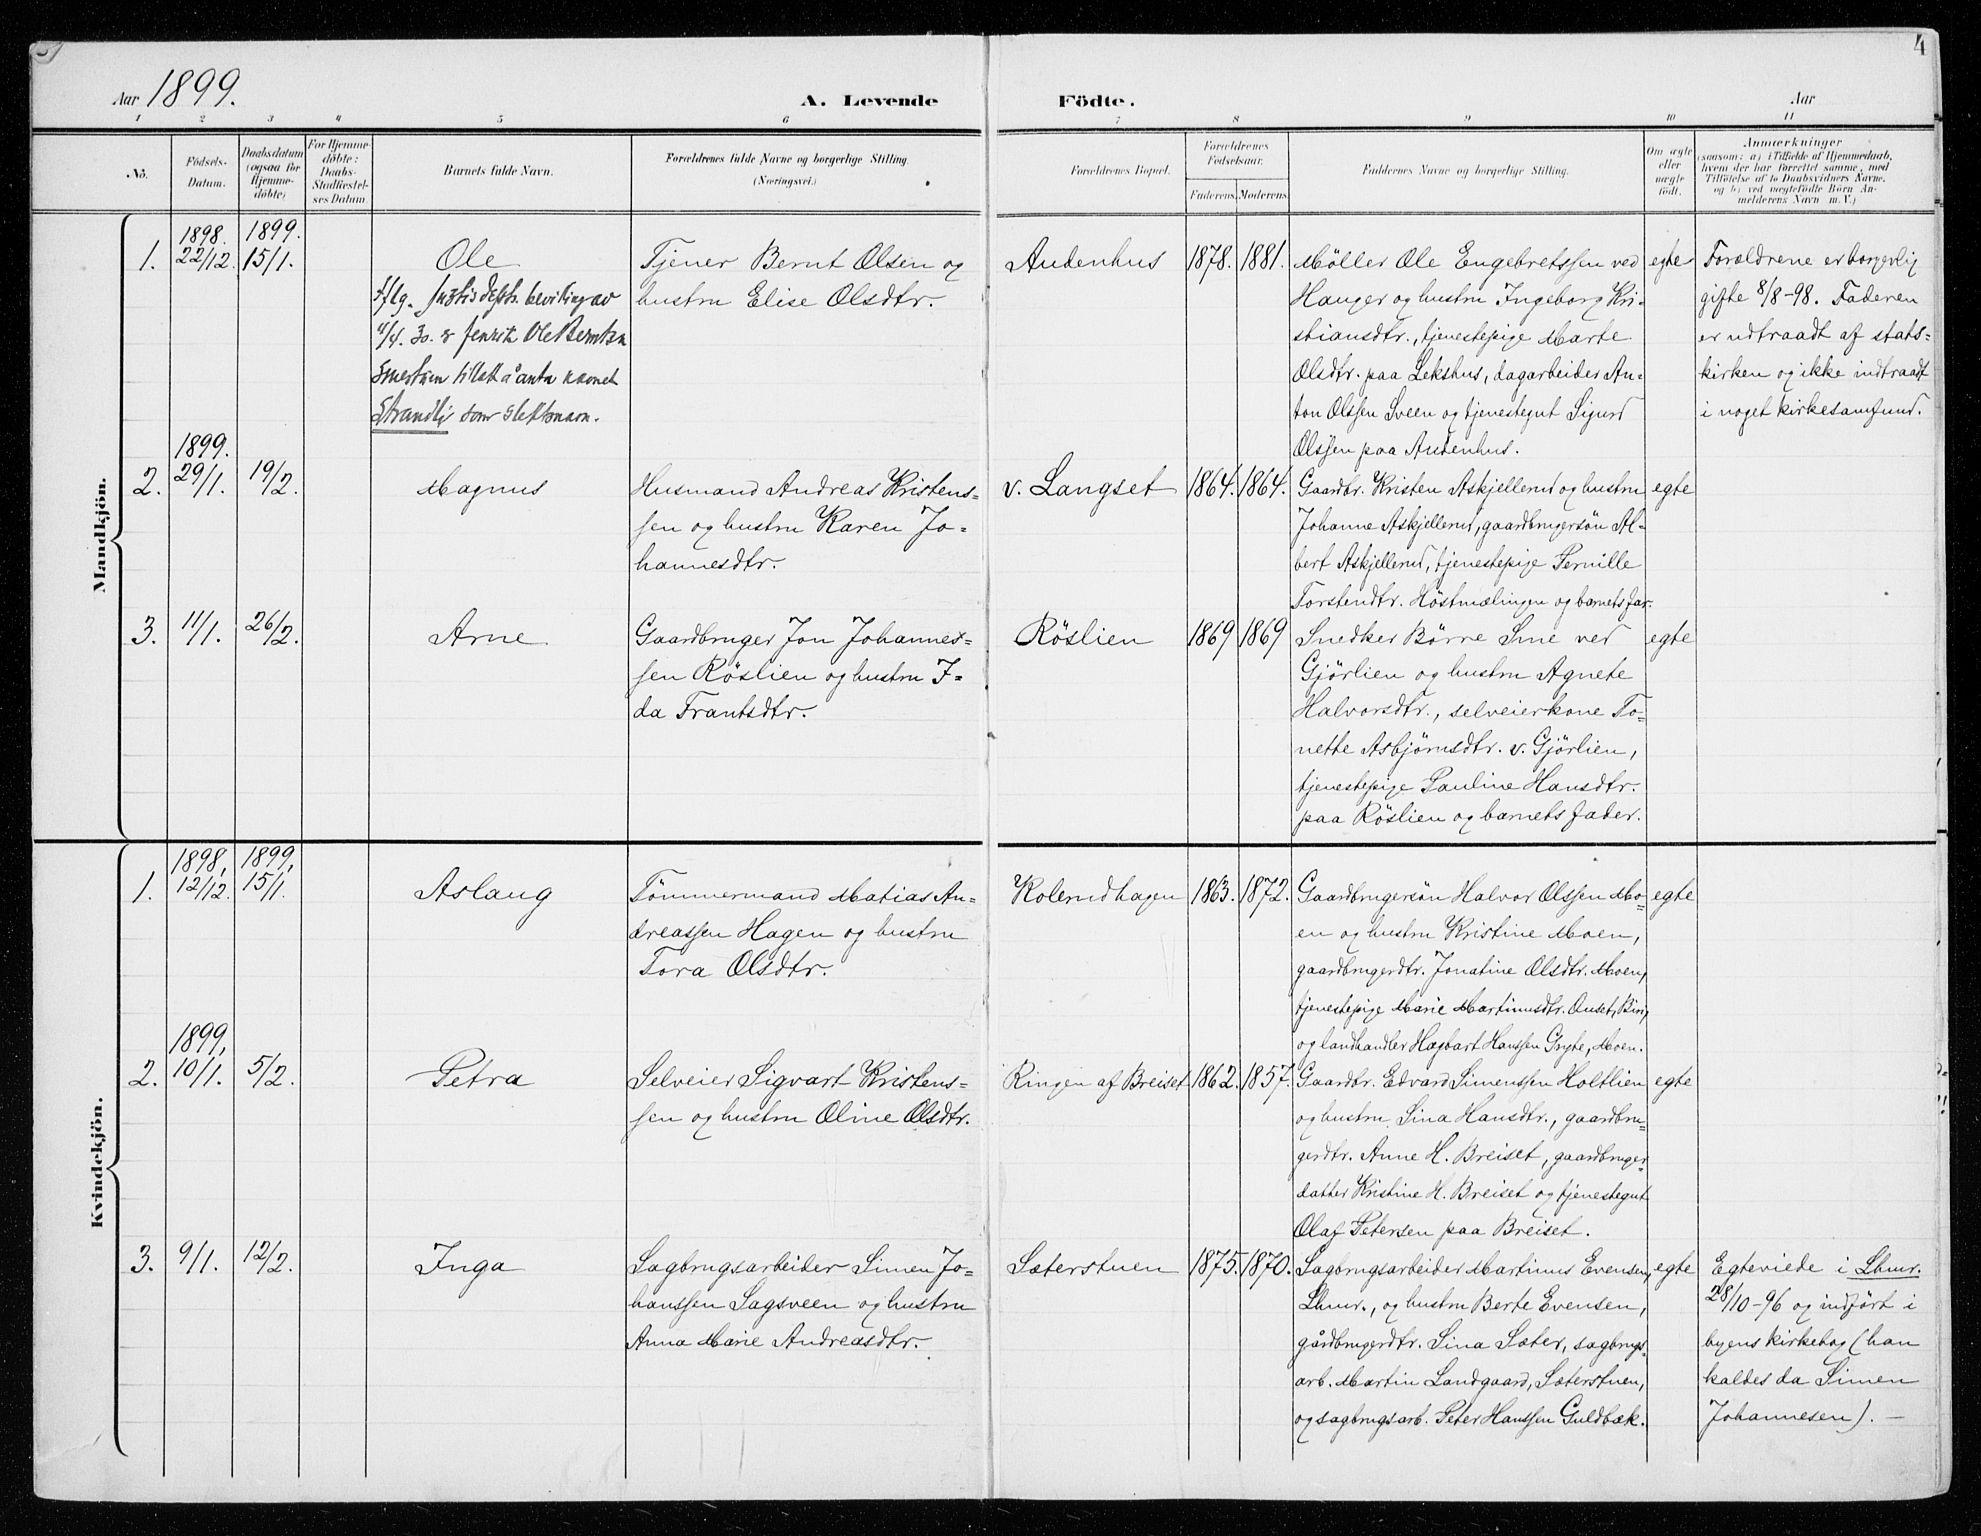 SAH, Fåberg prestekontor, H/Ha/Haa/L0011: Ministerialbok nr. 11, 1899-1913, s. 4